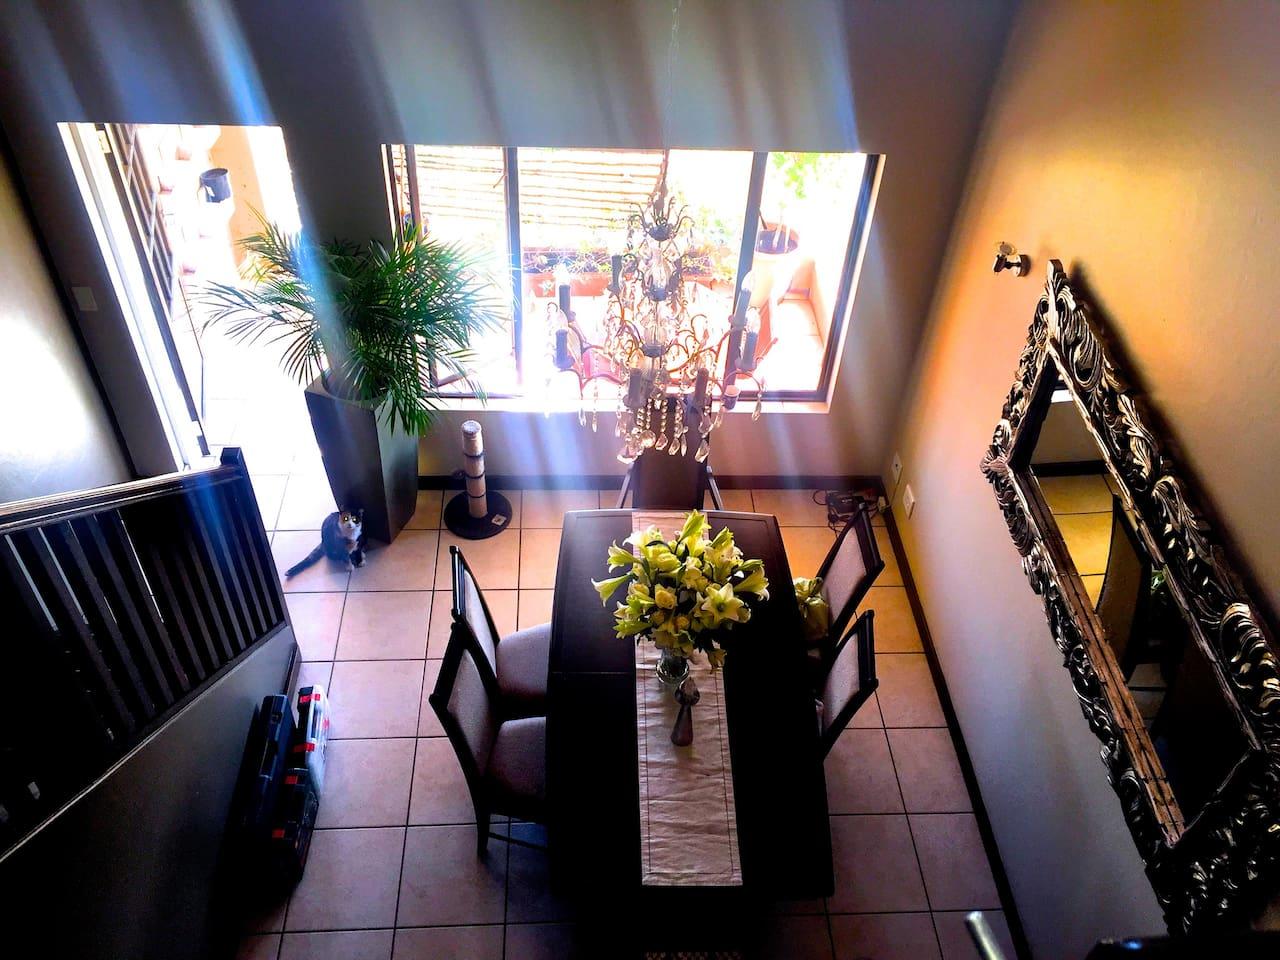 Upstairs loft overlooking dining room